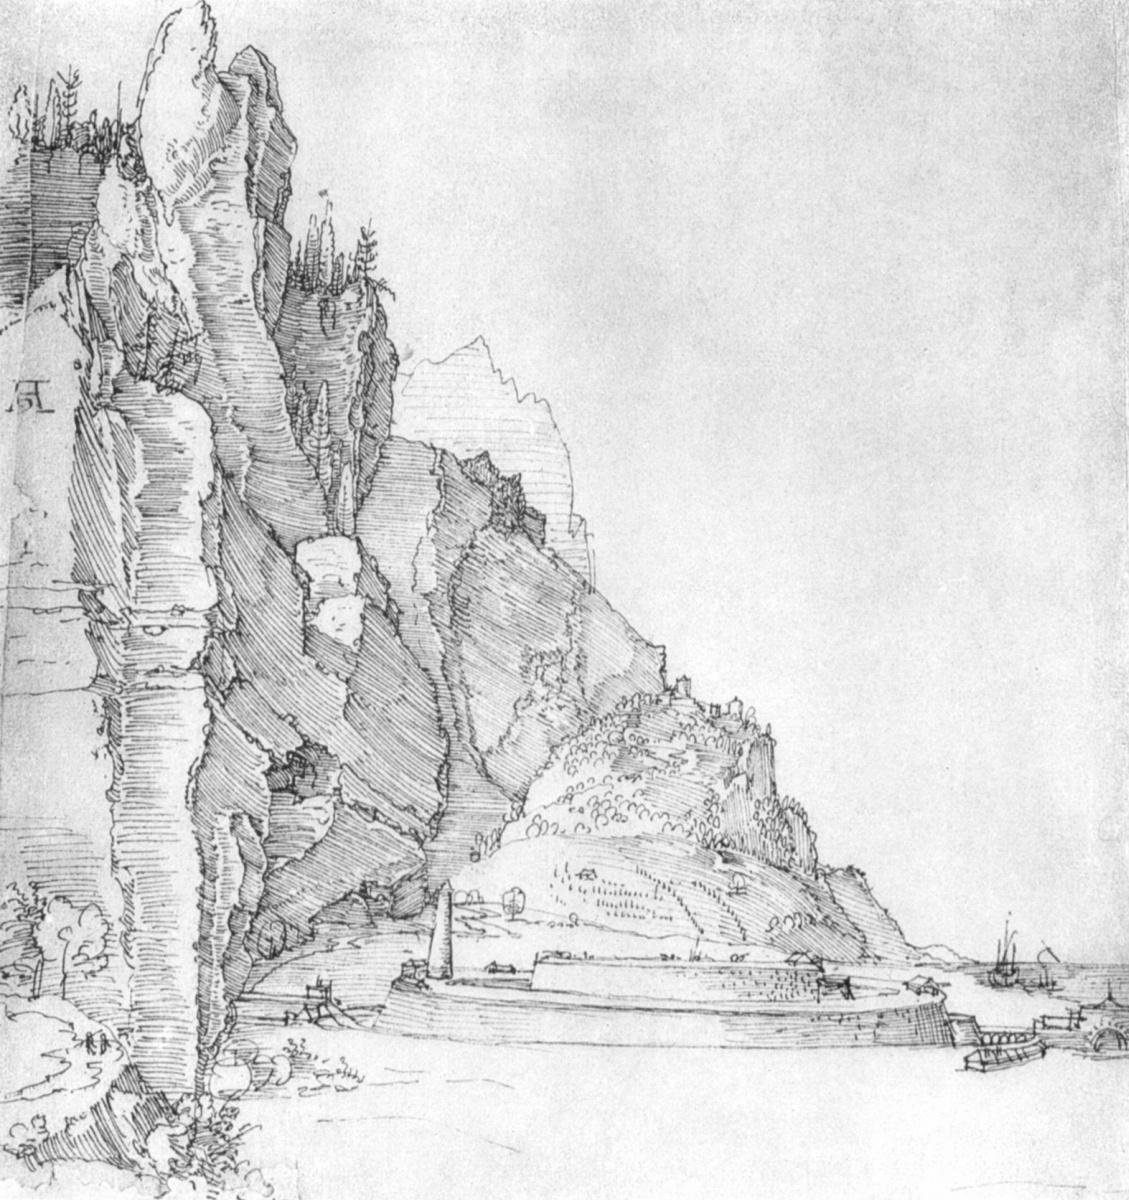 Albrecht Dürer. The fortress between mountains and the sea